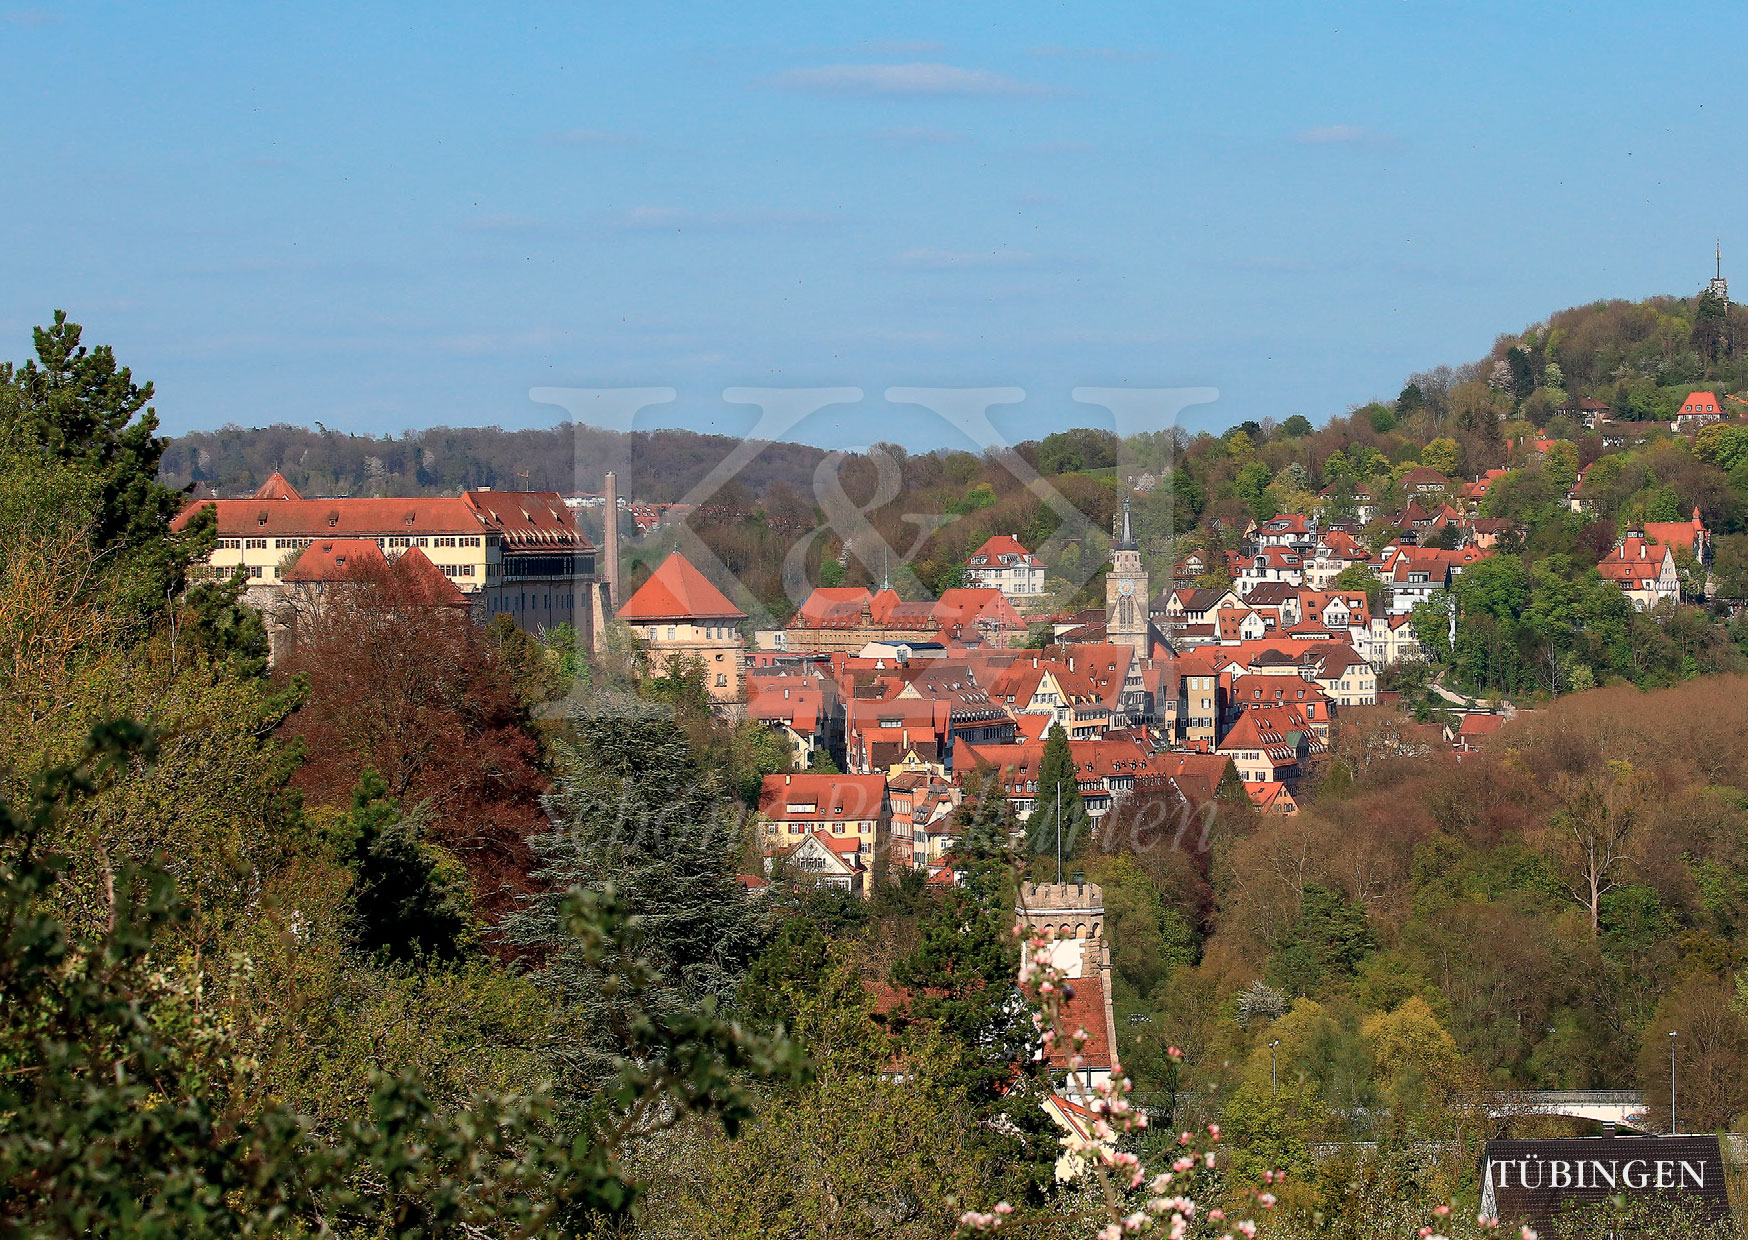 >>> NEU: Schöne Postkarte Nr. 6 · Tübinger Altstadt mit Stiftskirche, Schloss und Österberg